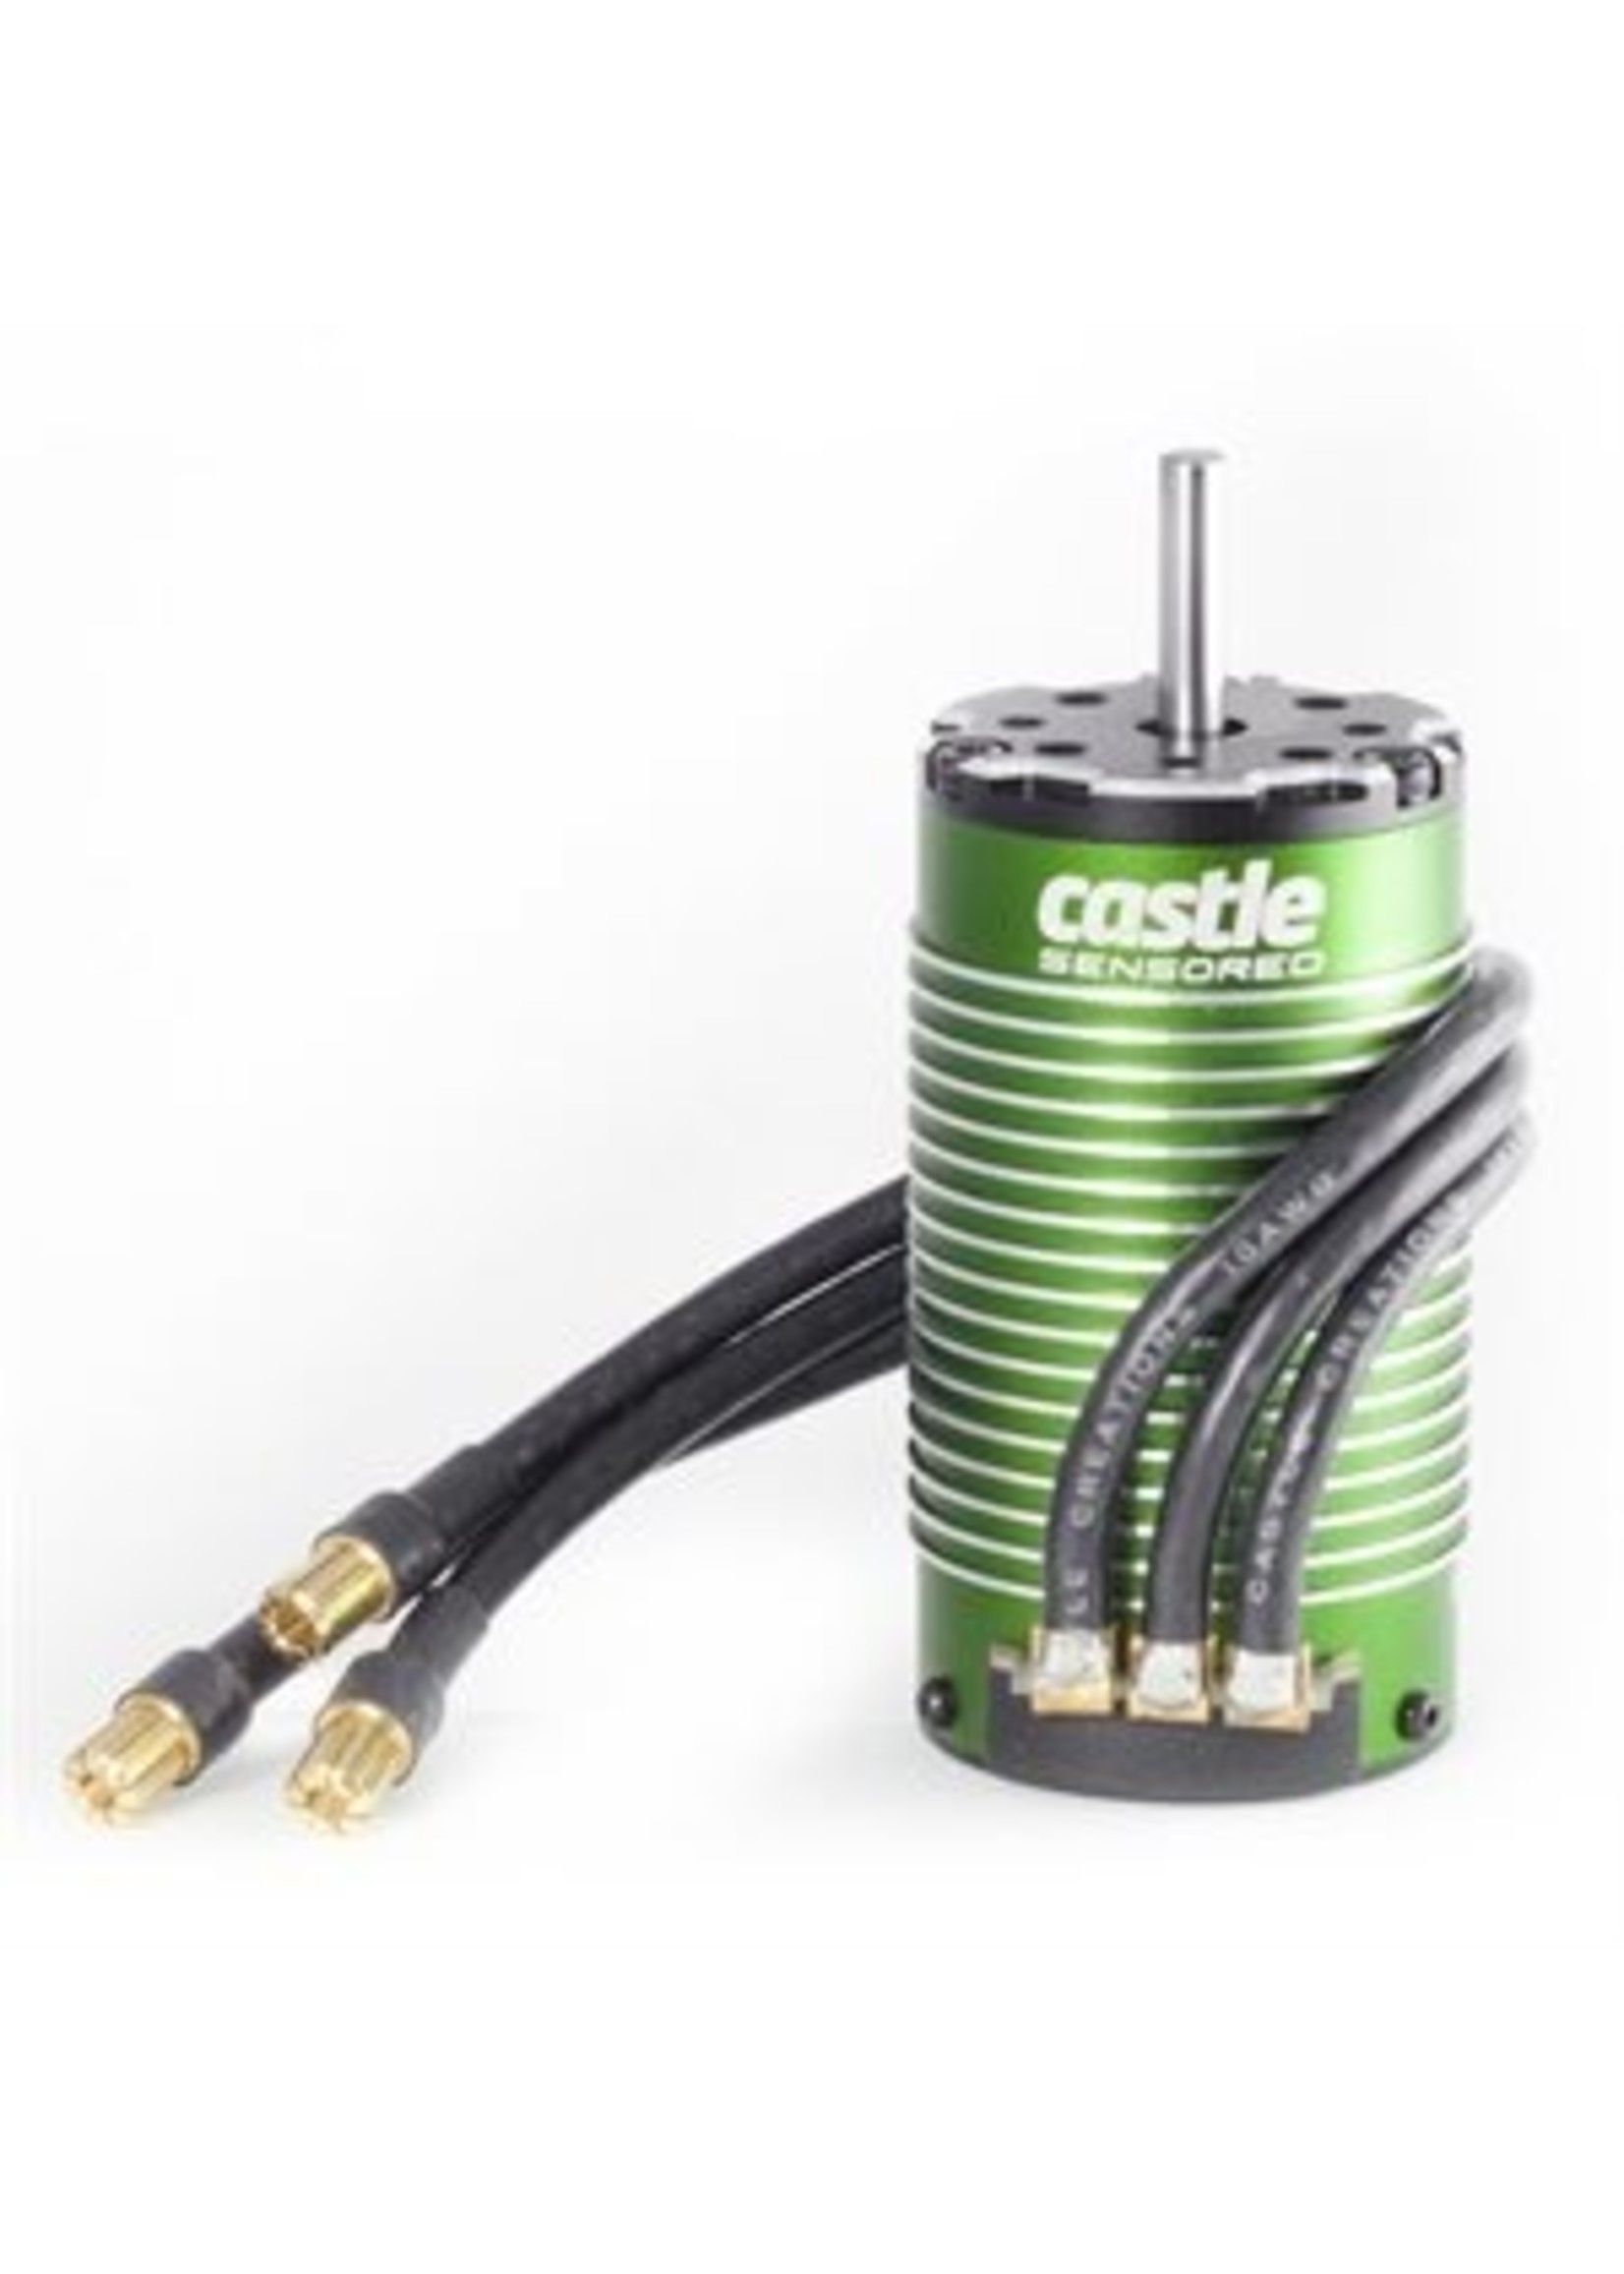 Castle Creations CSE060-0061-00 Castle Creations 1512 1Y Sensored 4-Pole Brushless Motor (2650kV)